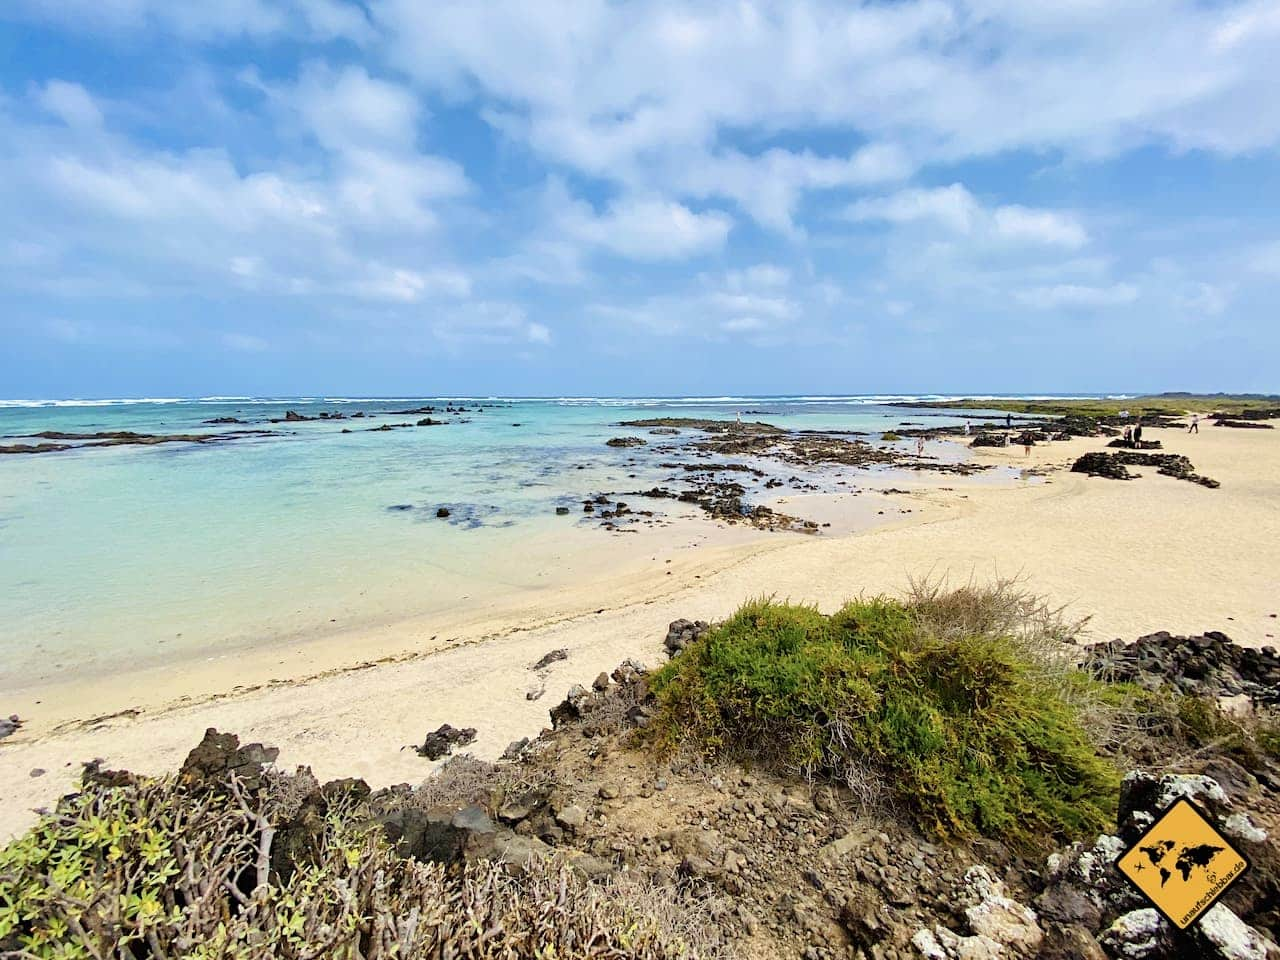 Kanaren welche Insel Strand Caleton Blanco Lanzarote